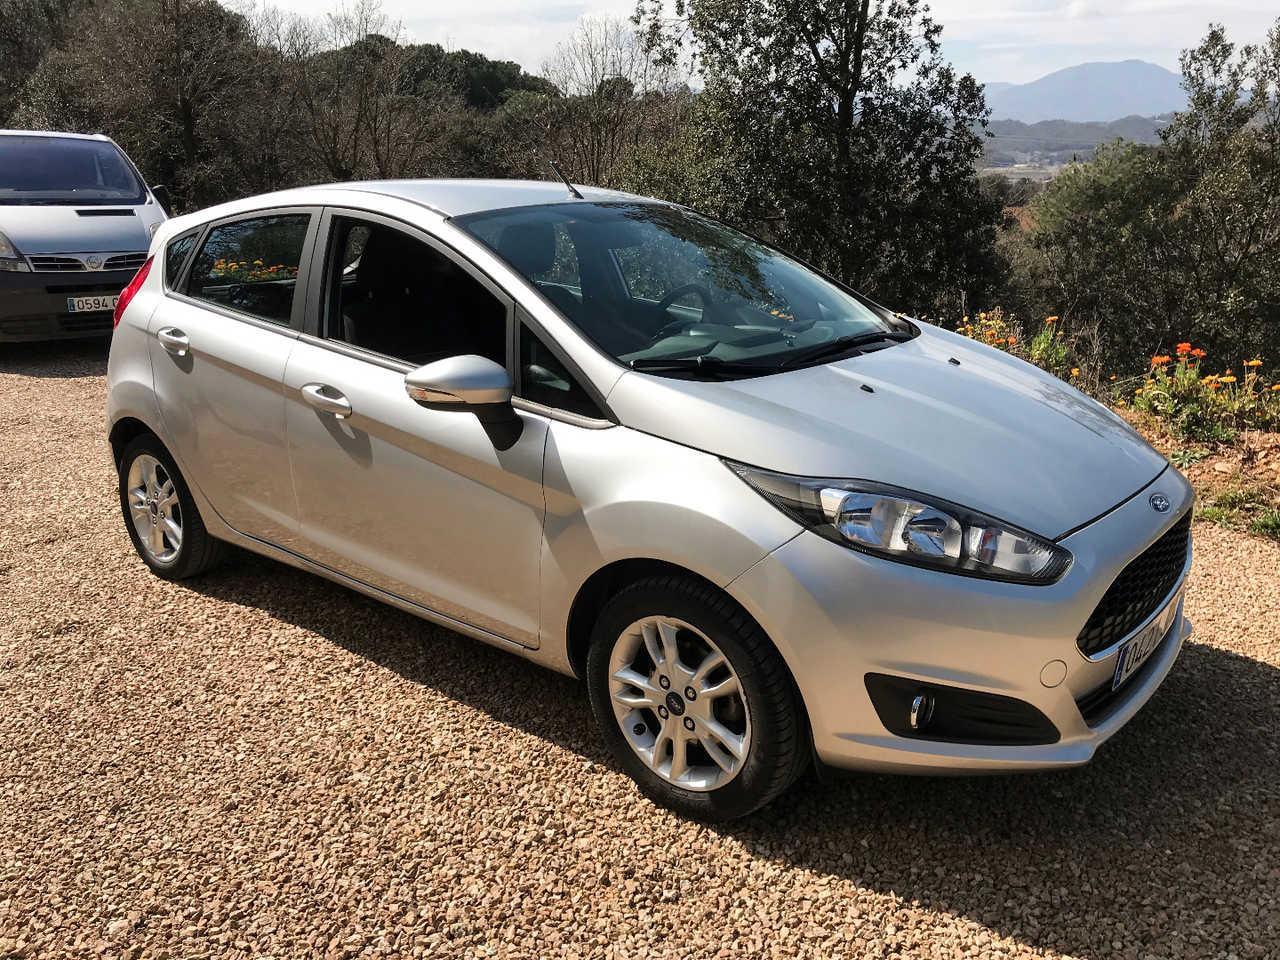 Ford Fiesta Trend 1.25 82CV Gasolina  - Foto 1